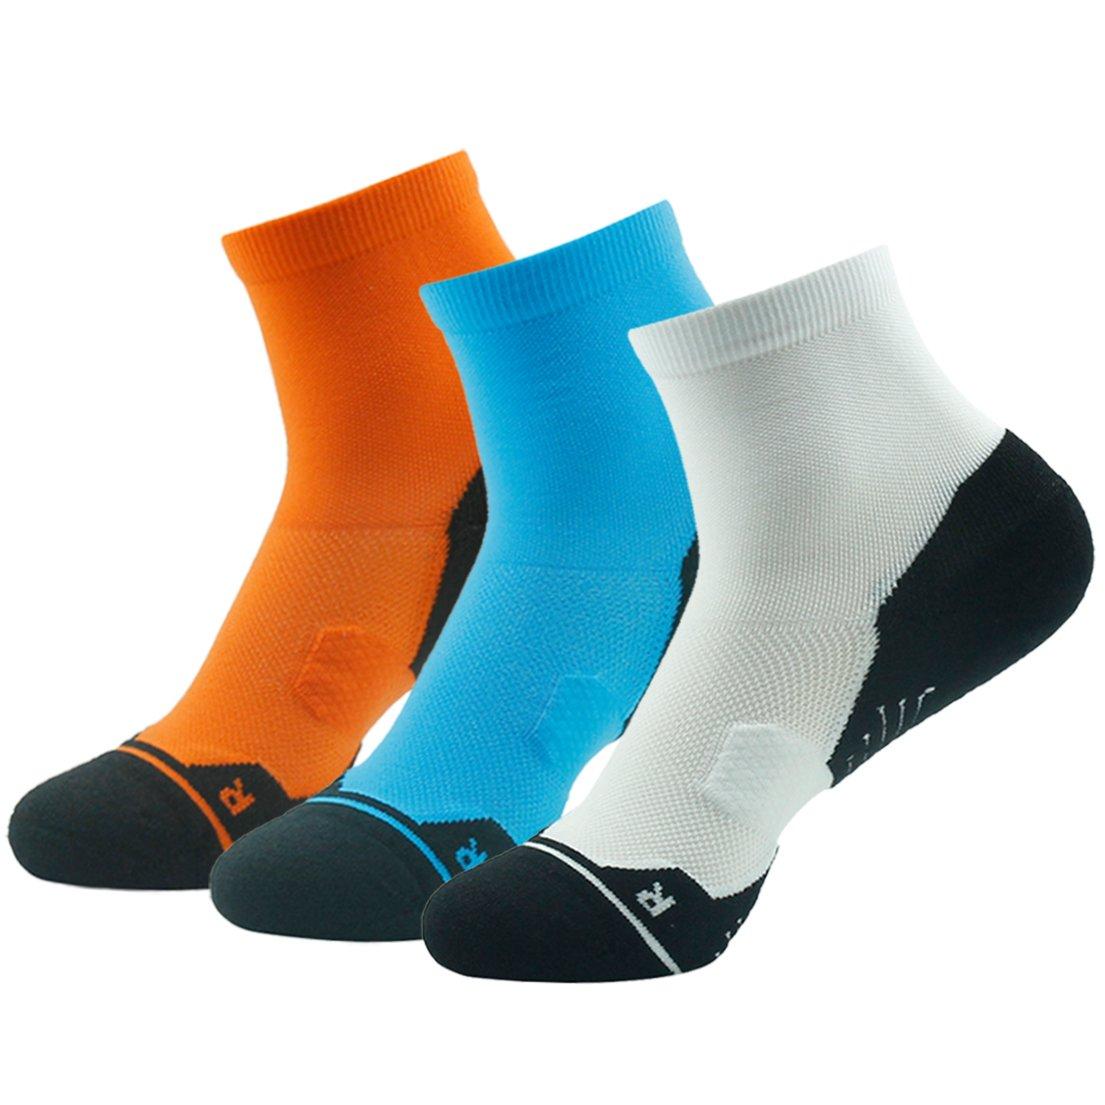 Z3 Pair bluee&orange&white Running Socks Support, HUSO Men Women High Performance Arch Compression Cushioned Quarter Socks 1,2,3,4,6 Pairs